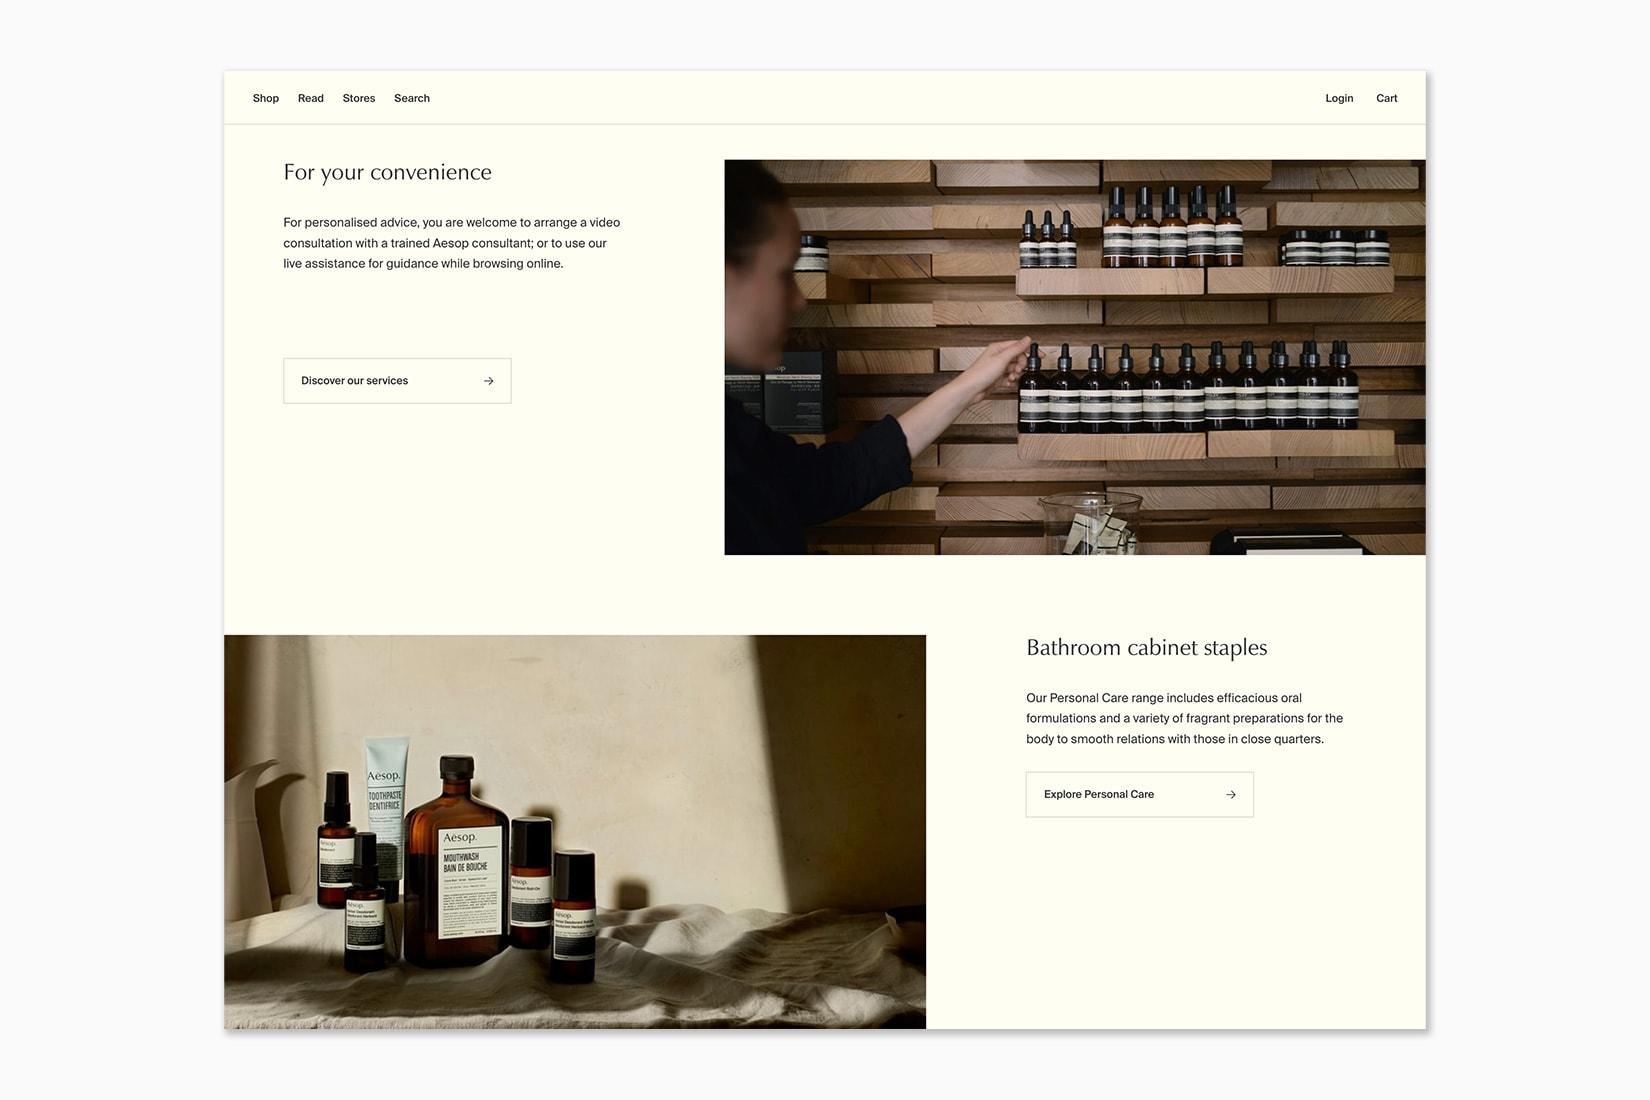 best online shopping sites women aesop - Luxe Digital